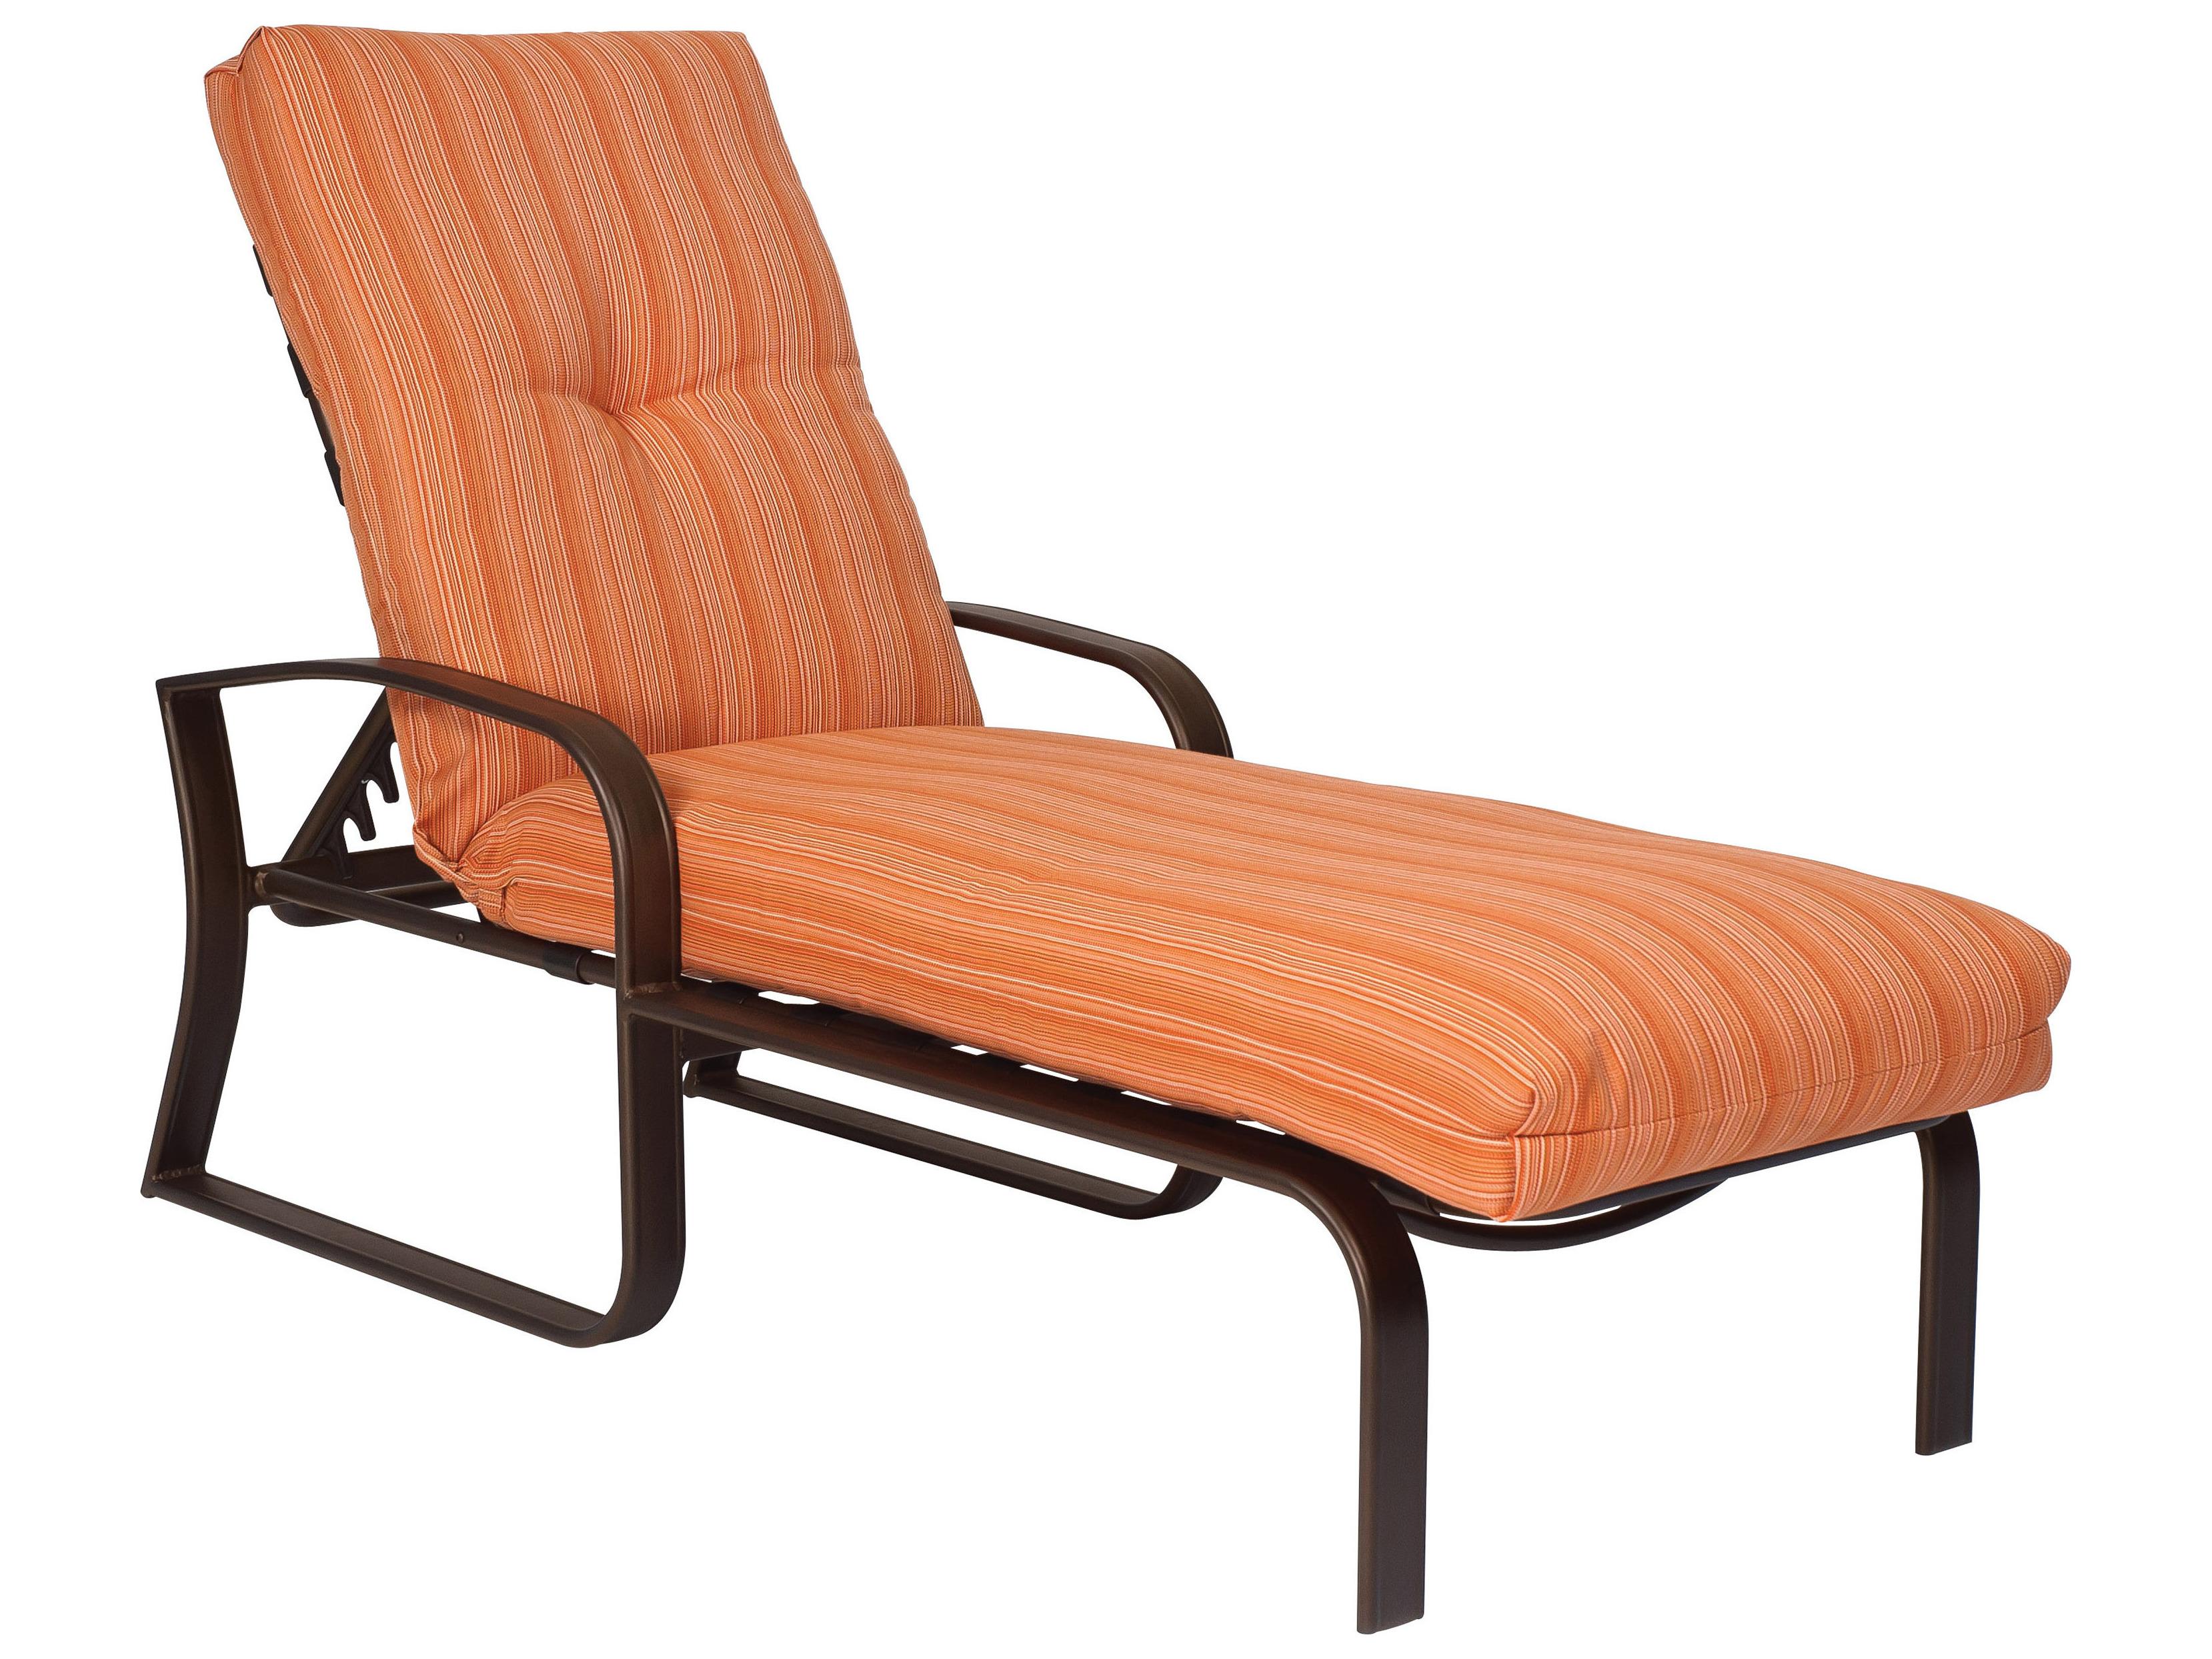 Woodard cayman isle cushion adjustable chaise lounge 2e0470 for Chaise lounge cushions